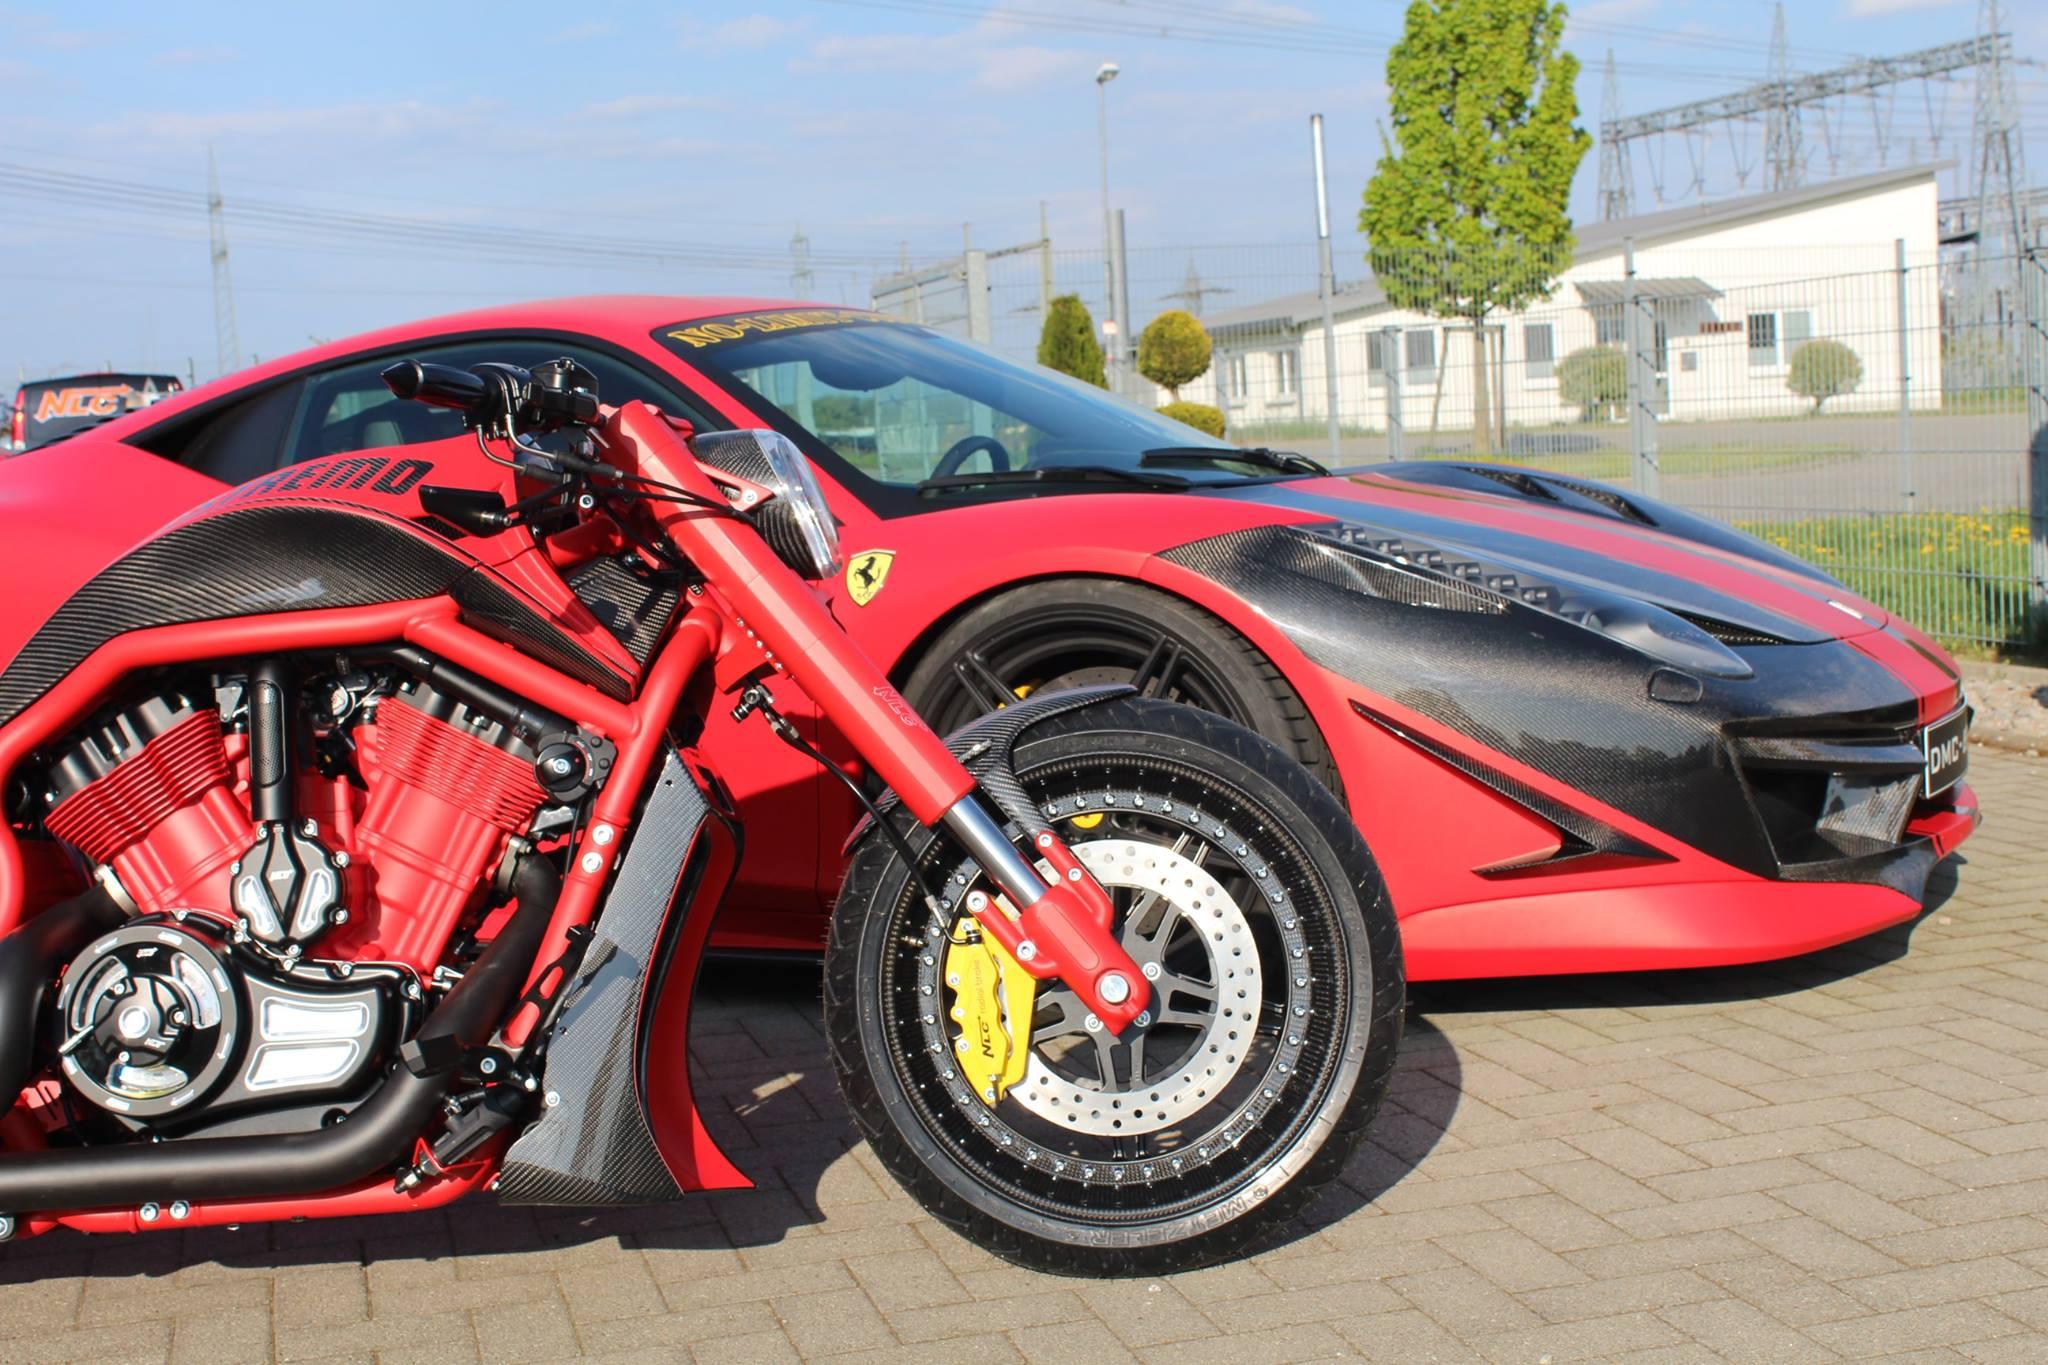 Dmc 458 Estremo Receives Nonidentical Twin Bike From No